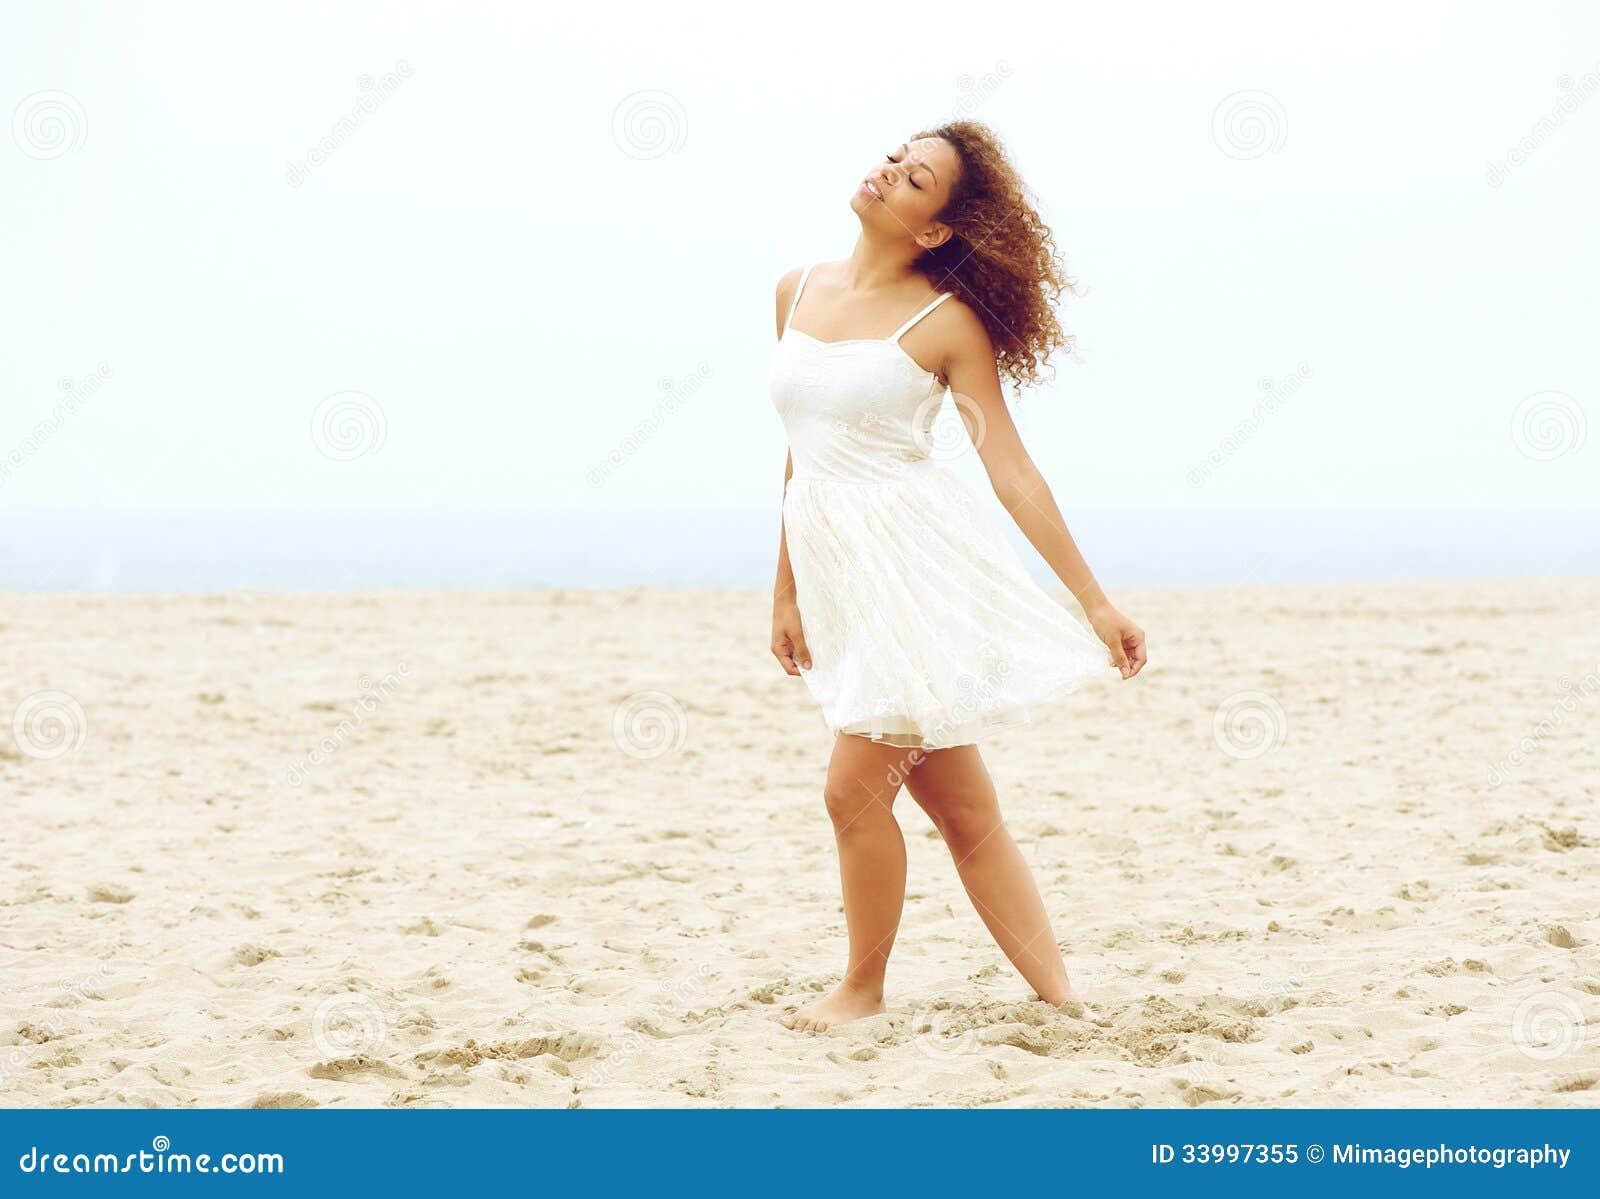 Beautiful Young Woman Walking On Beach In White Dress ...